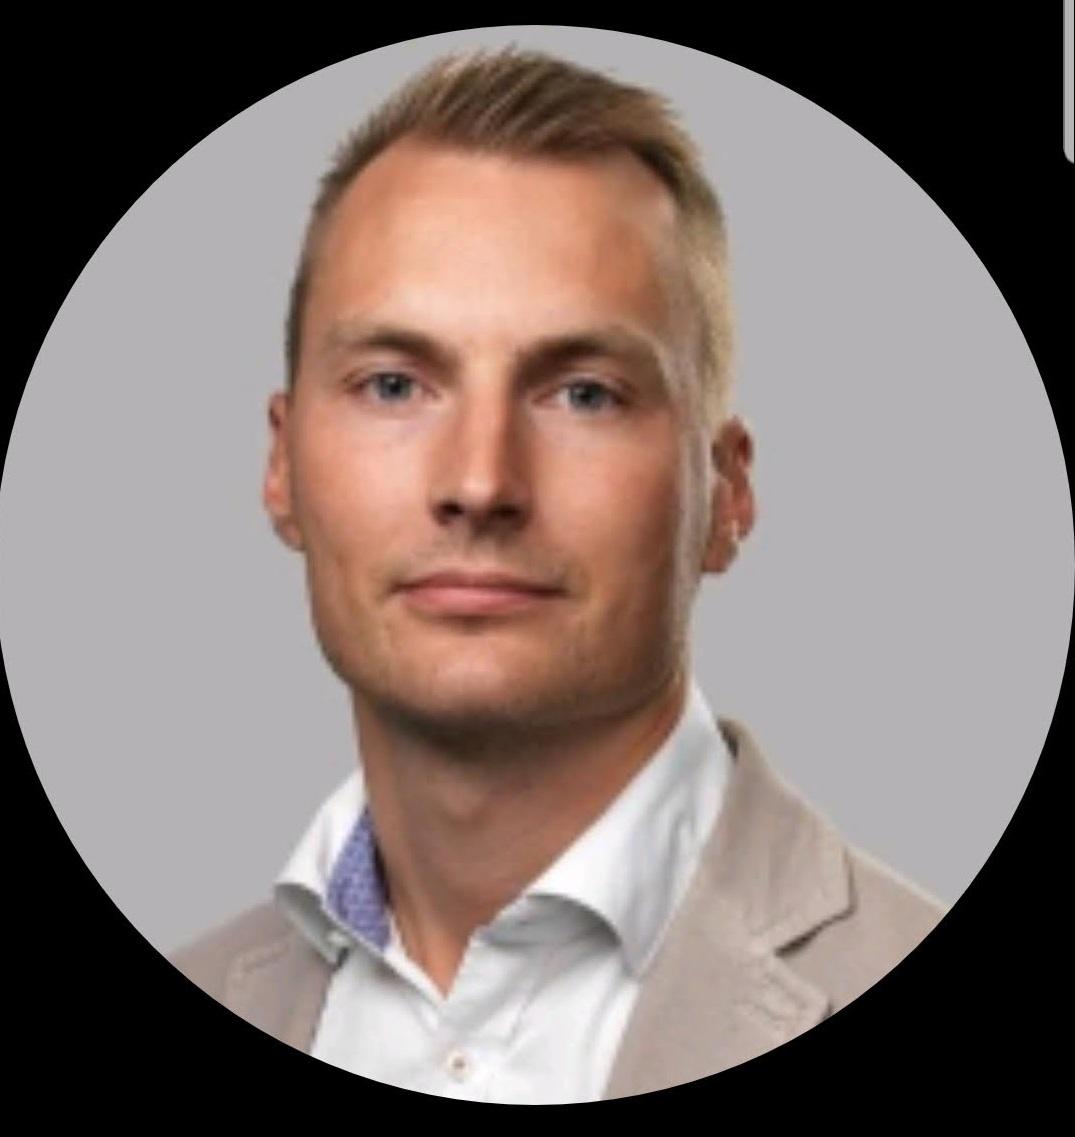 Max Runnqvist - JOBMeal